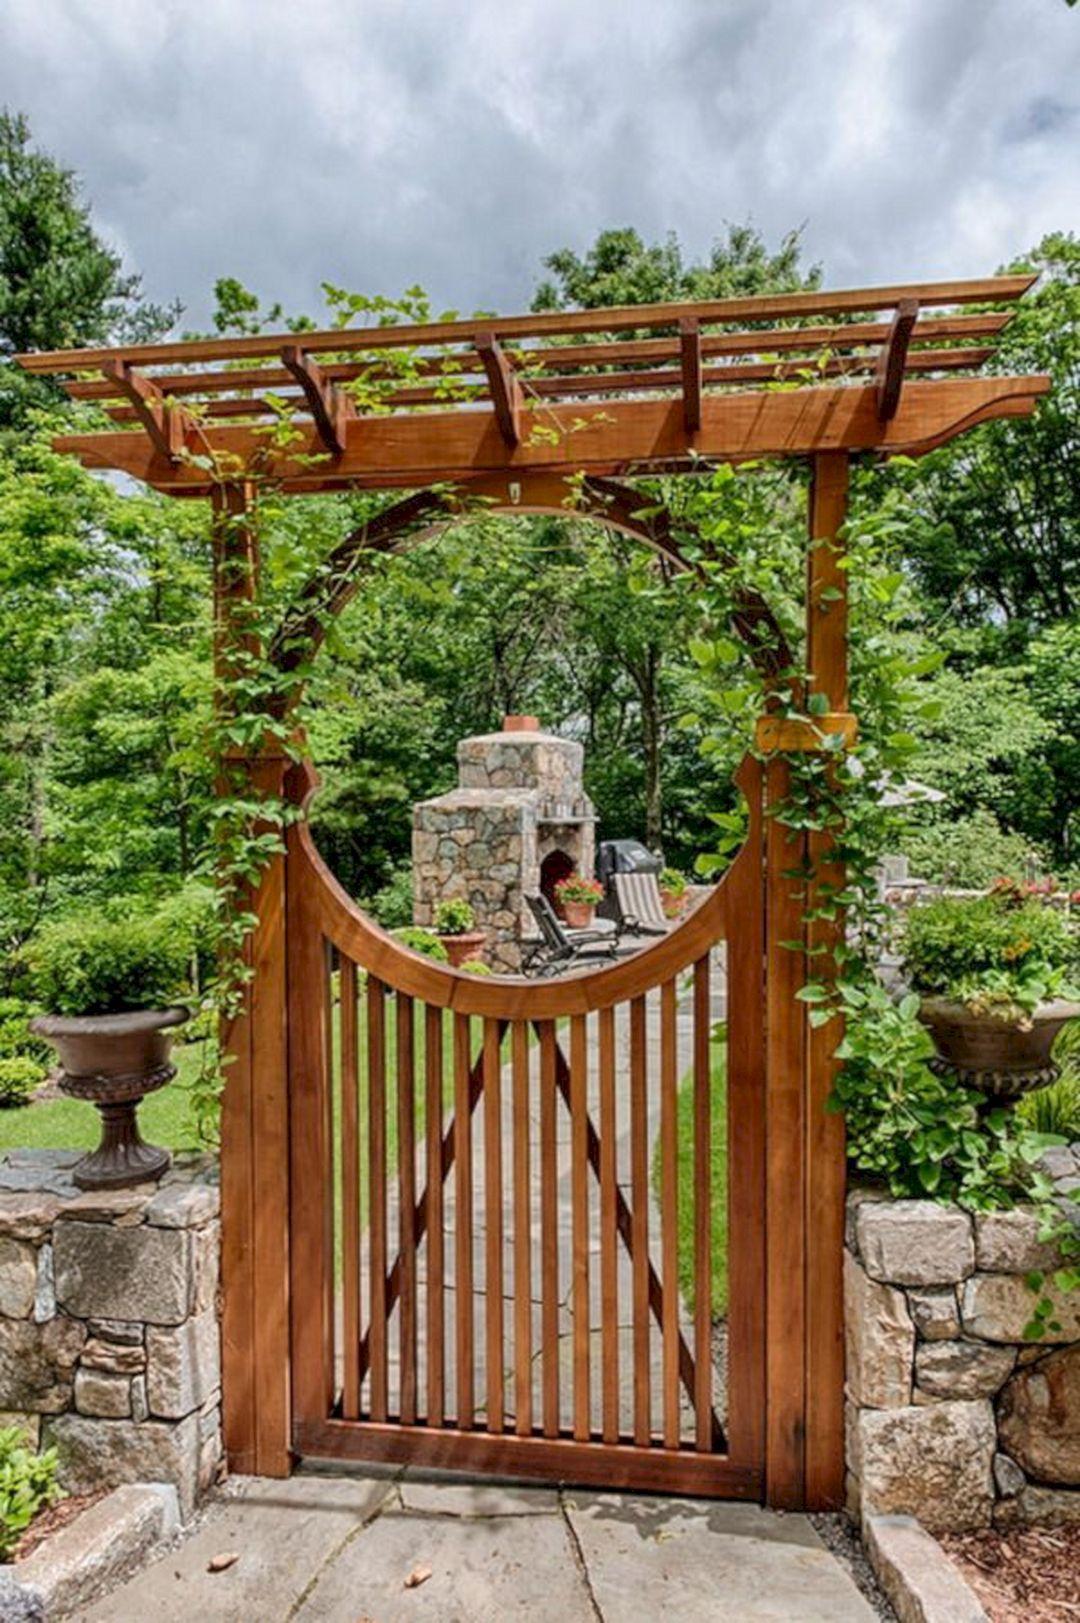 24 Beautiful Garden Gates And Fences Design Ideas For Inspiration Wooden Garden Gate Garden Doors Wooden Garden